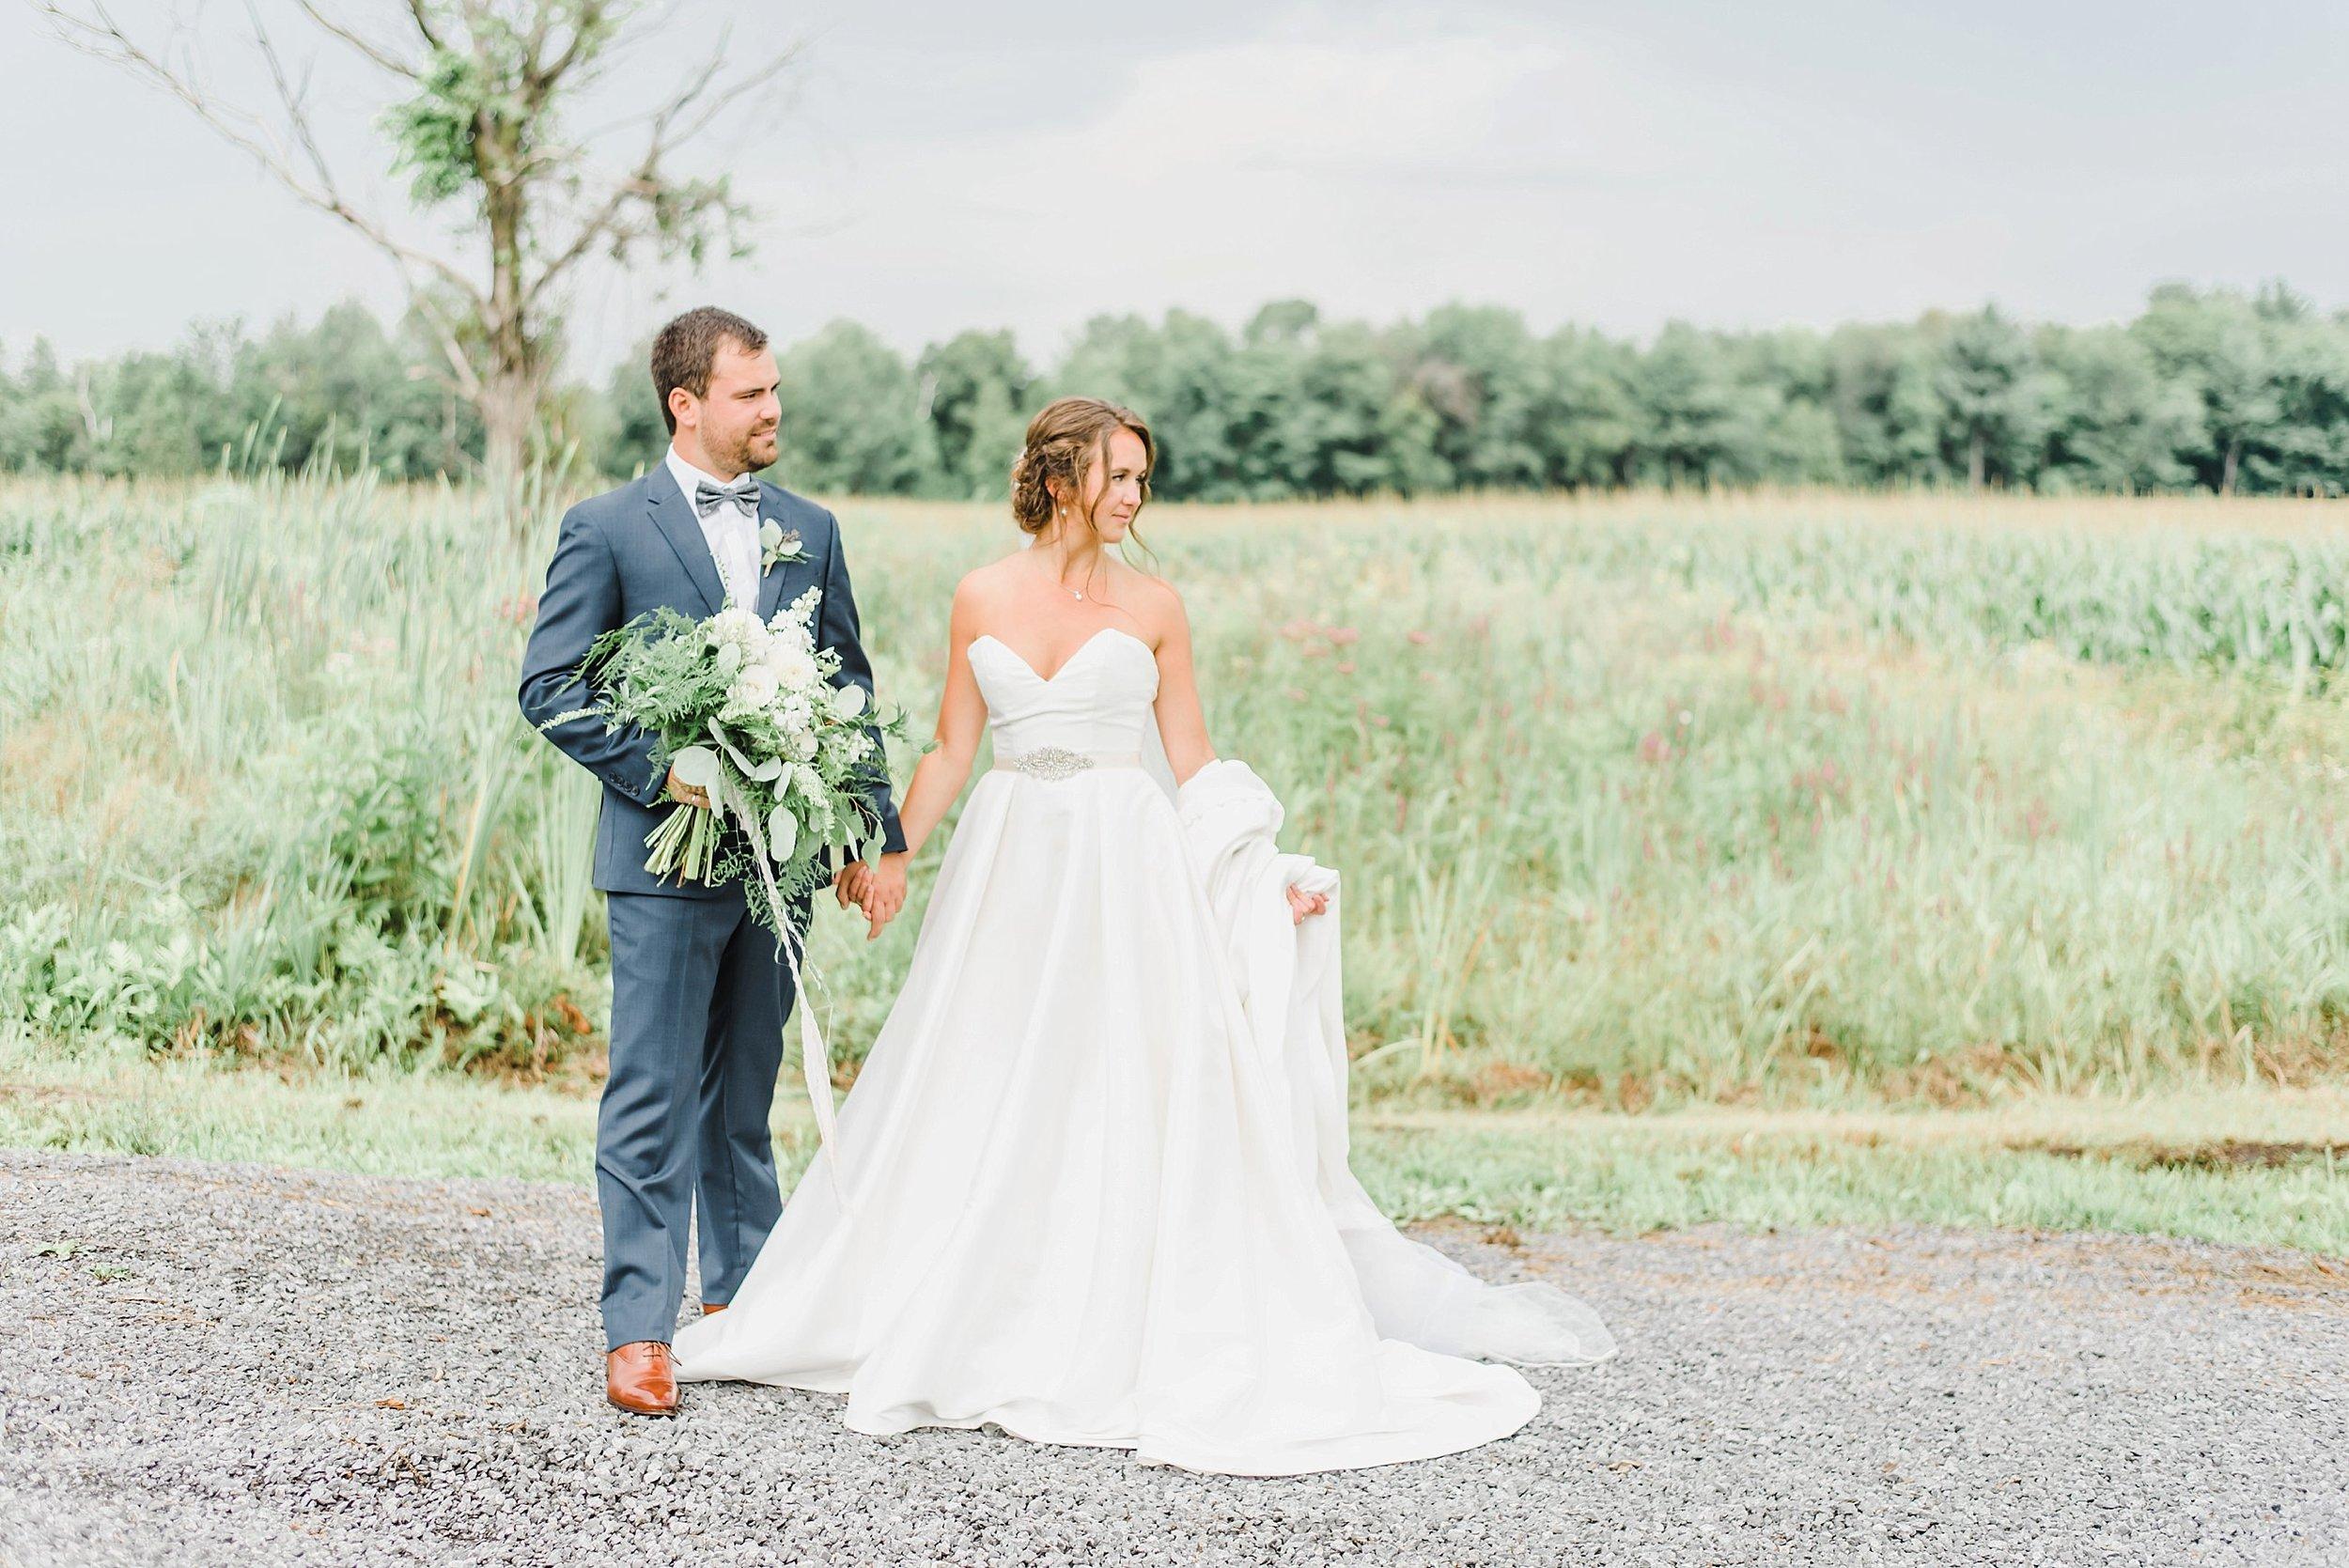 light airy indie fine art ottawa wedding photographer | Ali and Batoul Photography_0525.jpg